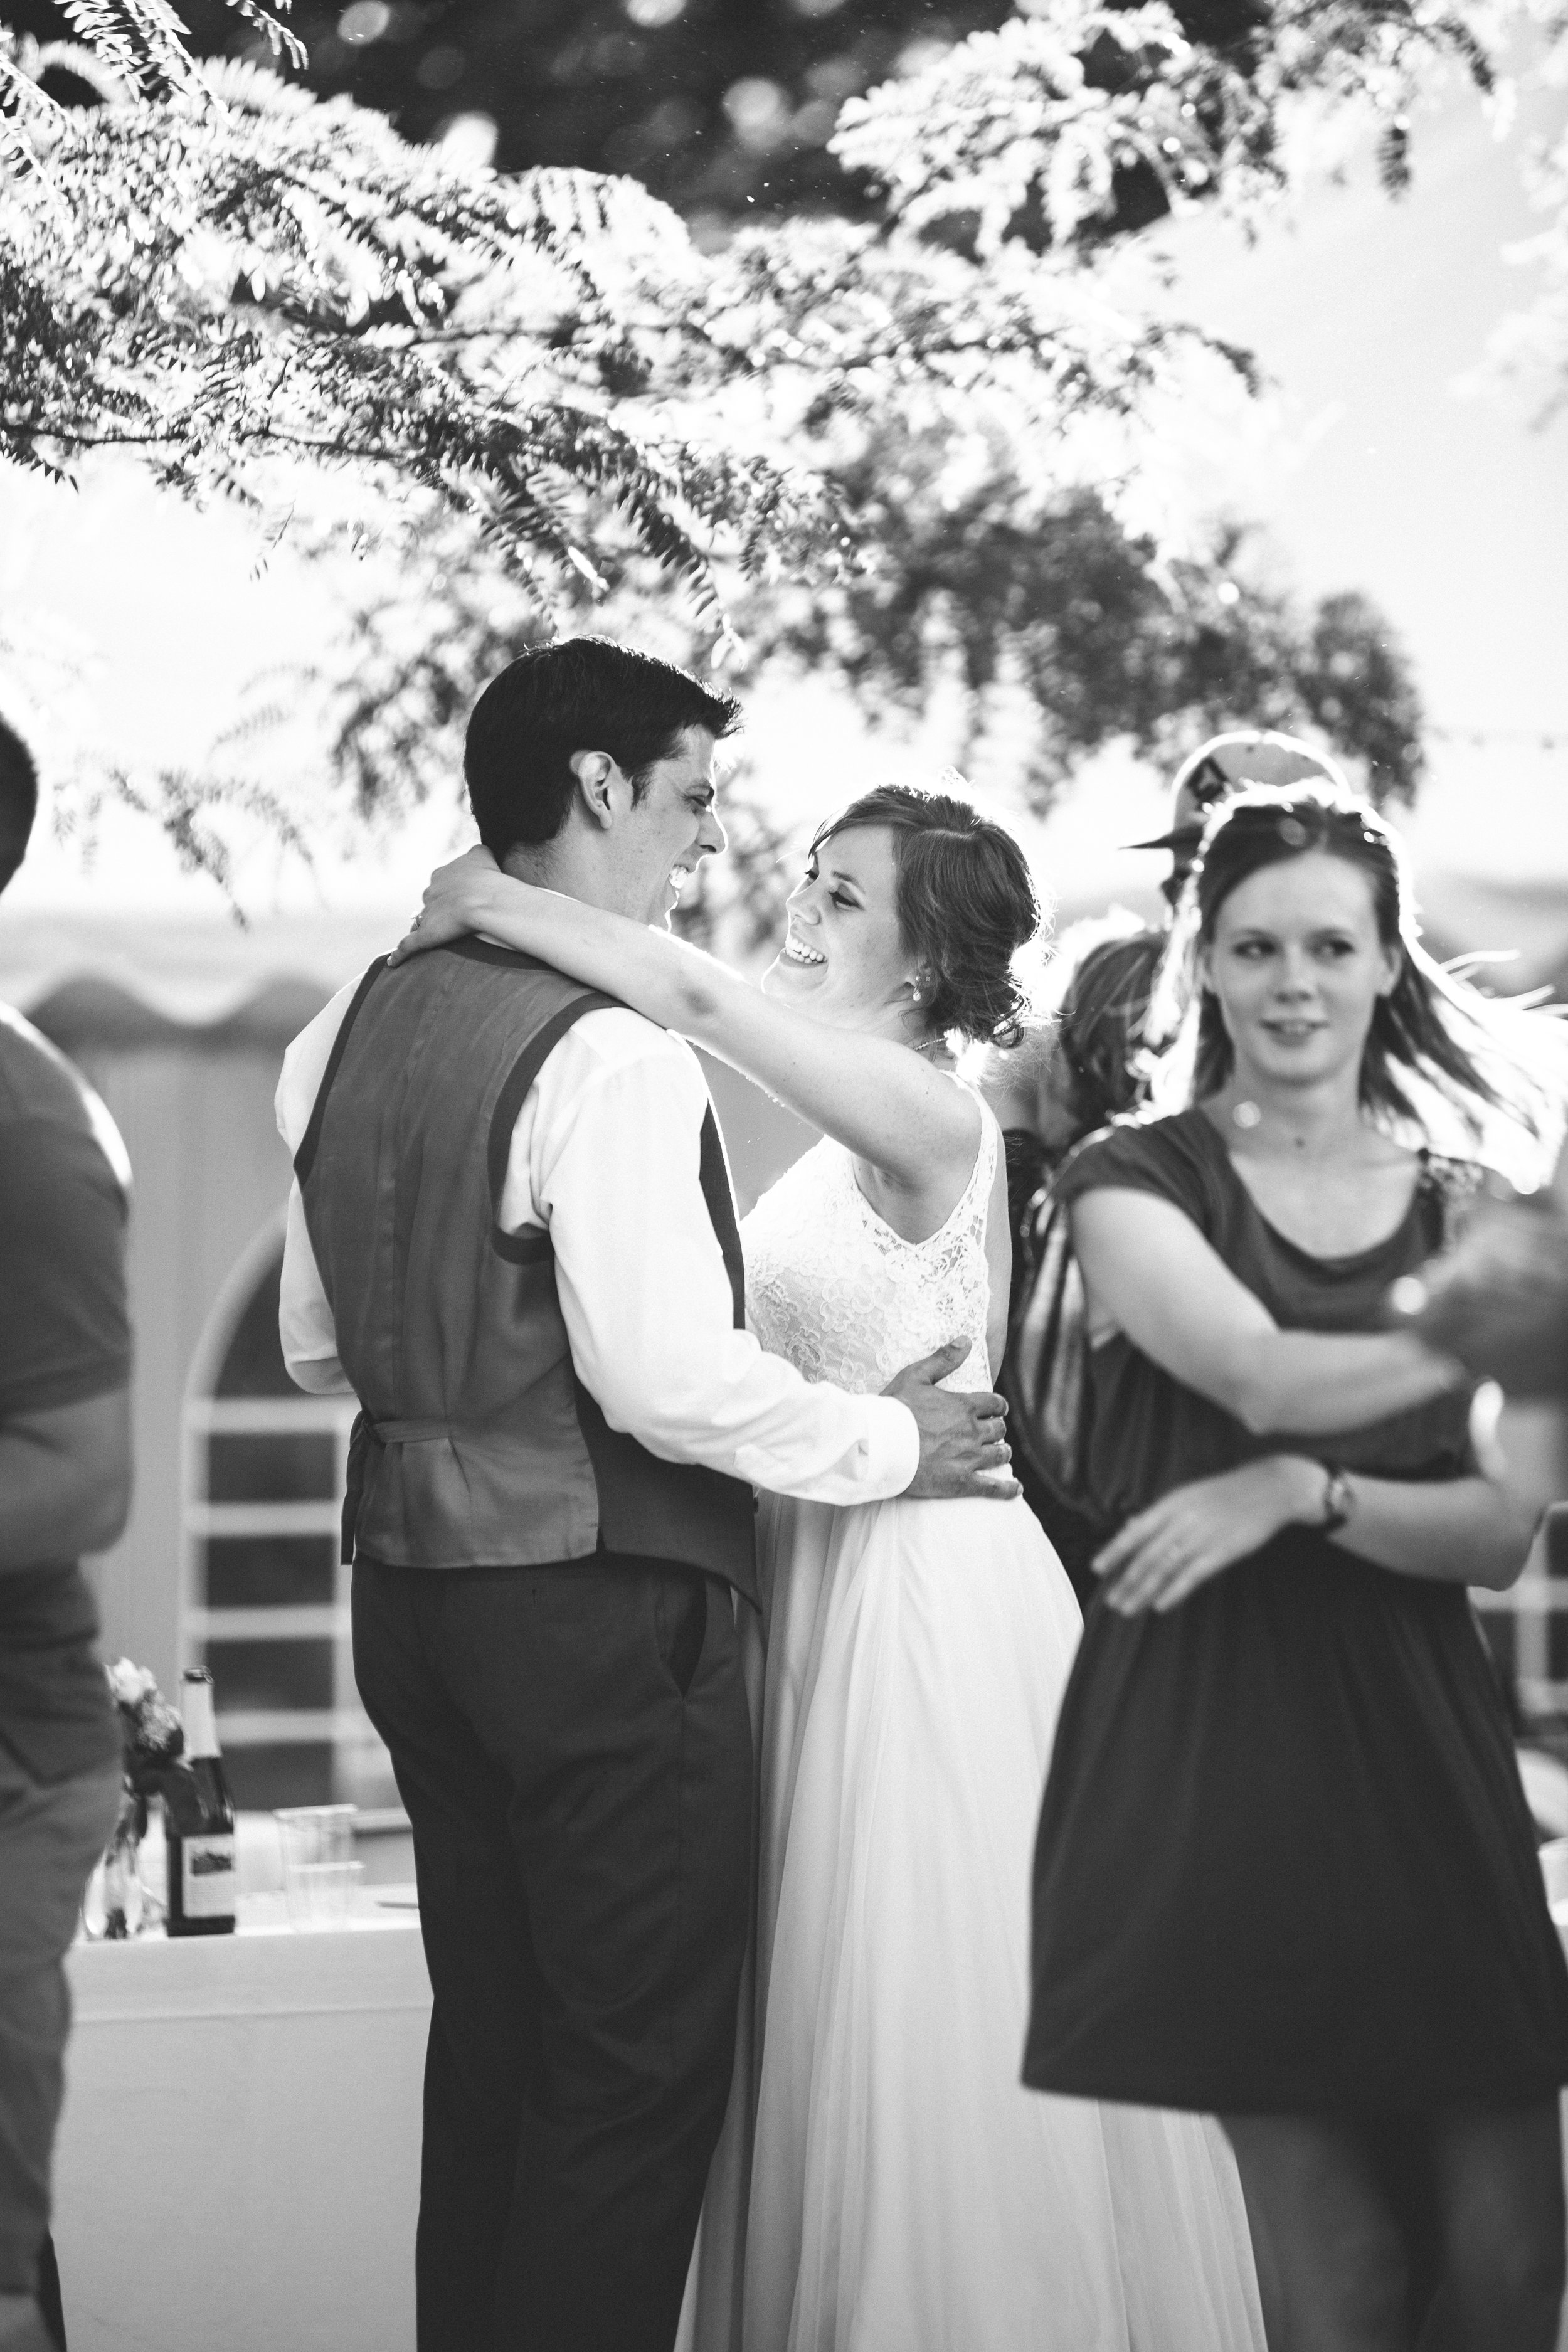 Jordan & Shantel Married - Idaho - Corrie Mick Photography-327.jpg